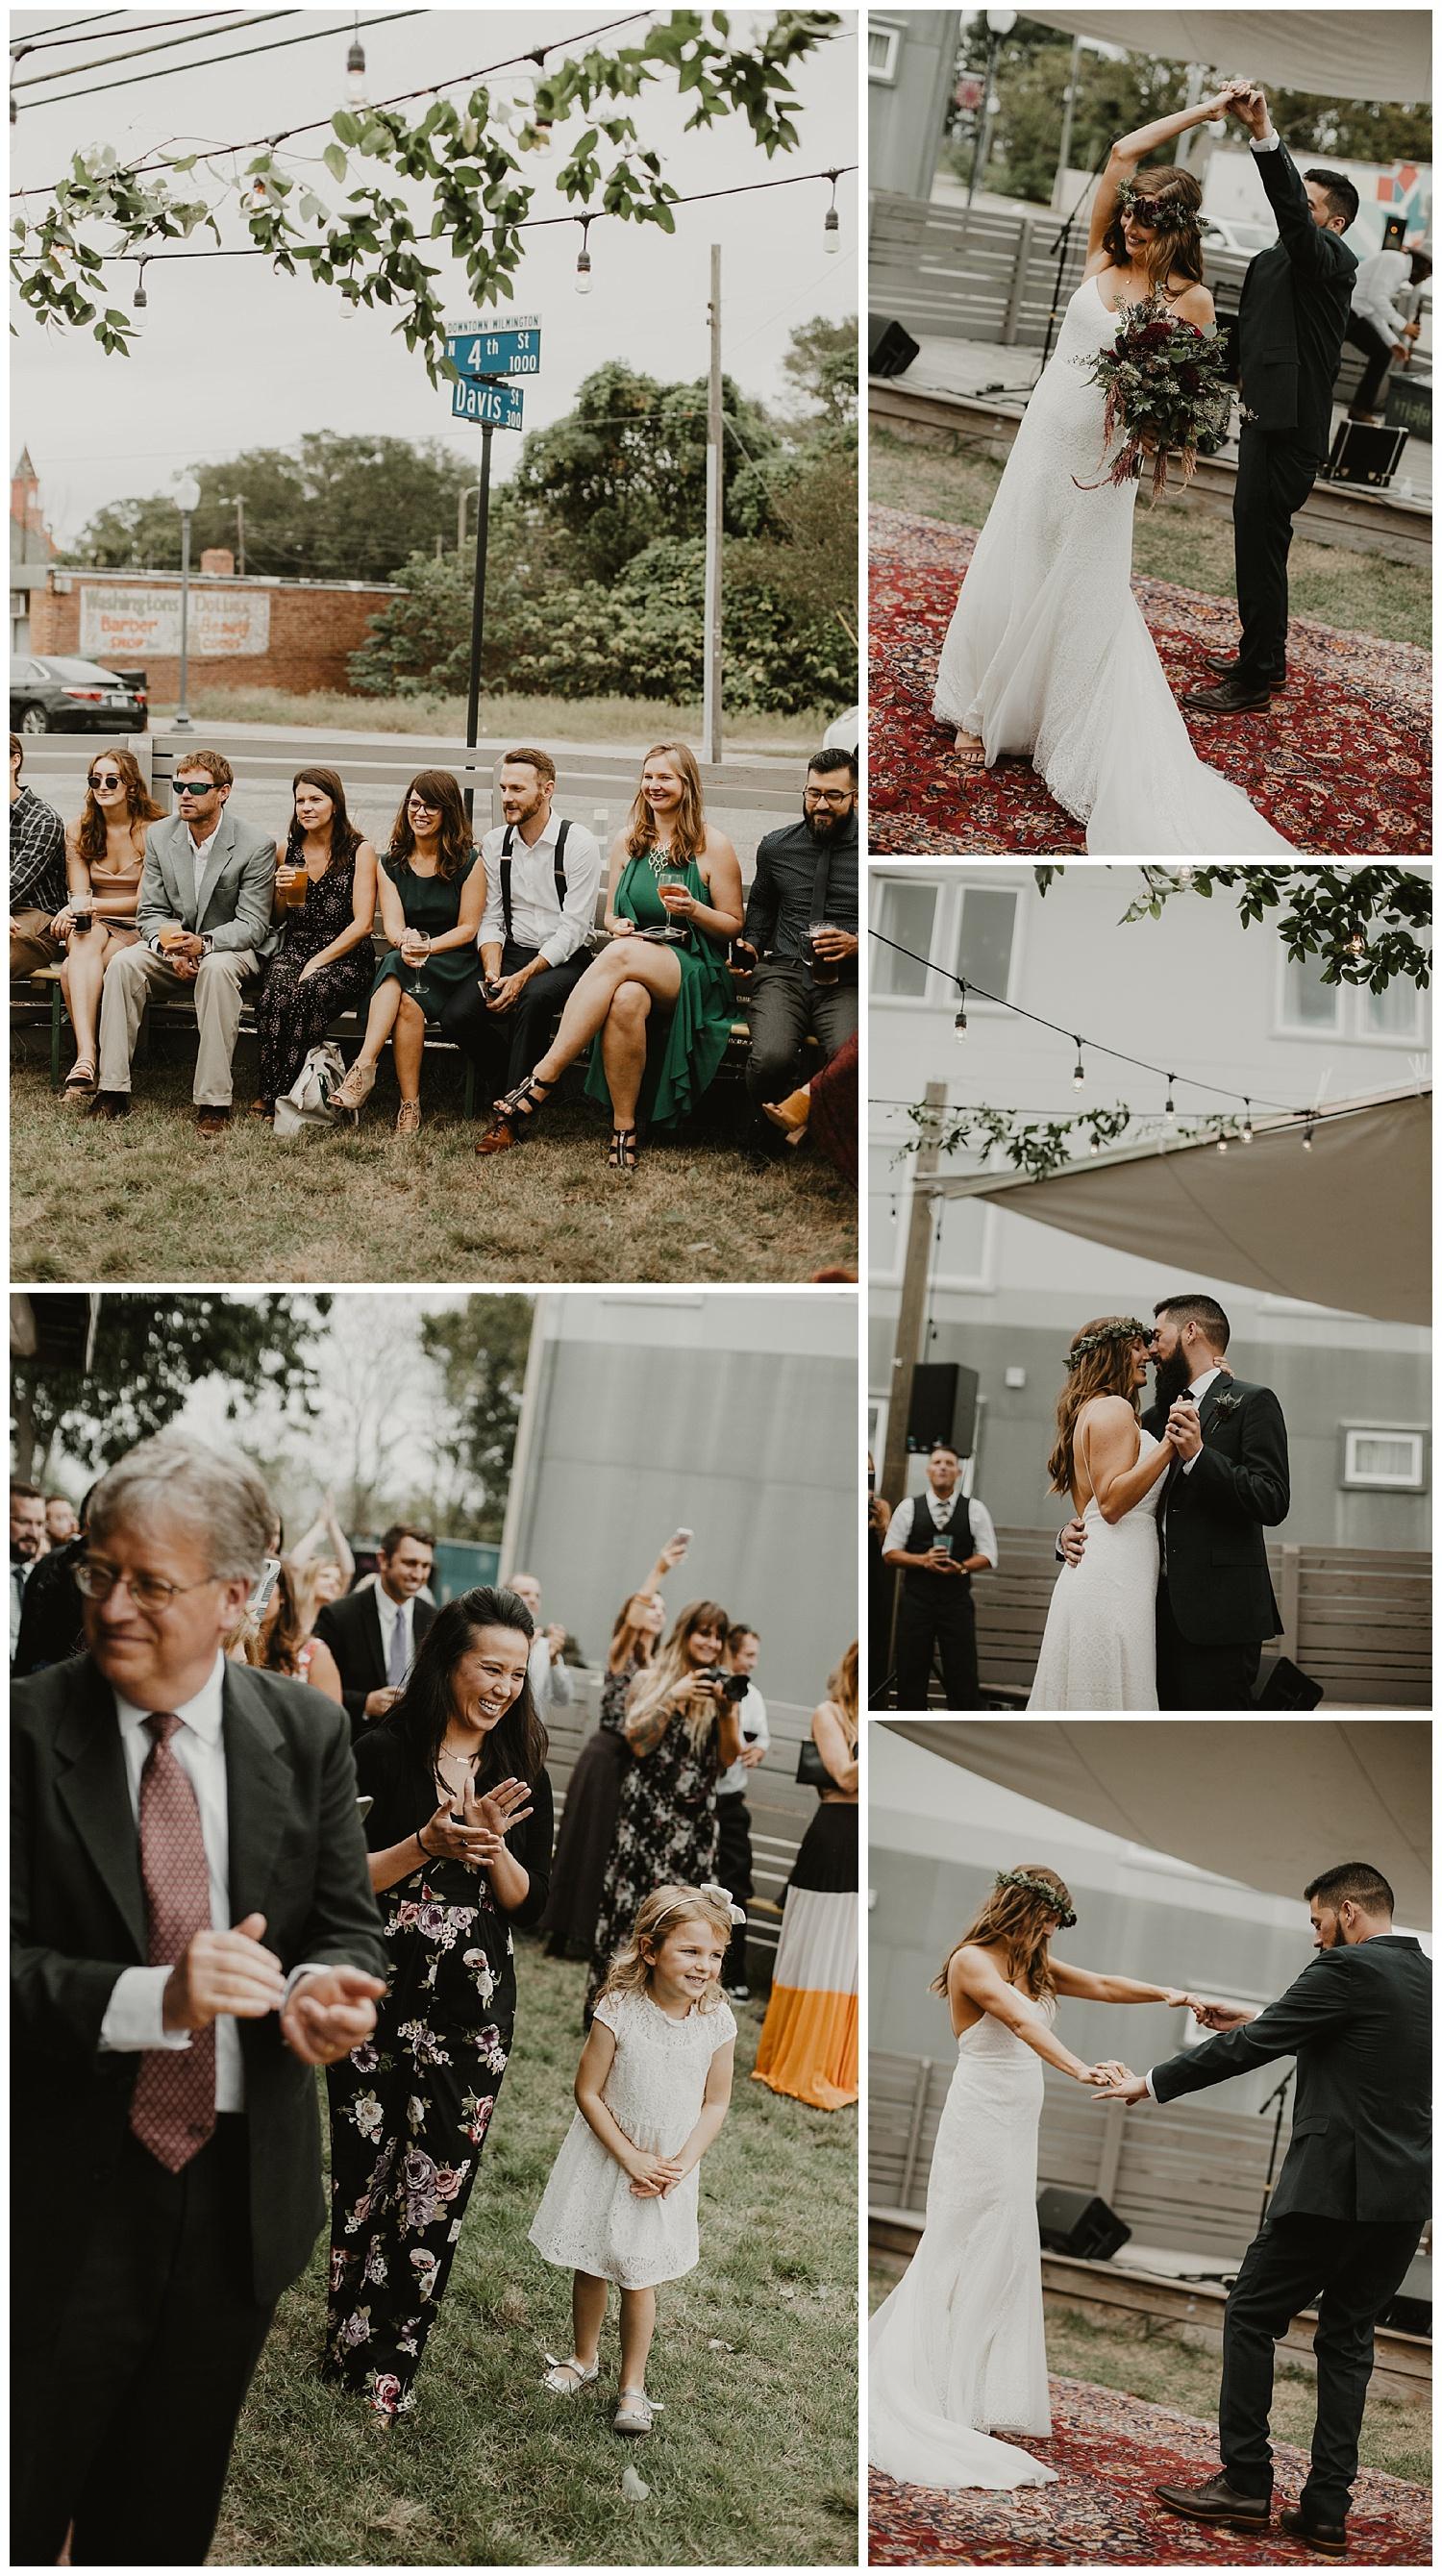 wilmington-nc-wedding-photographer-ethan-gaskill.jpg